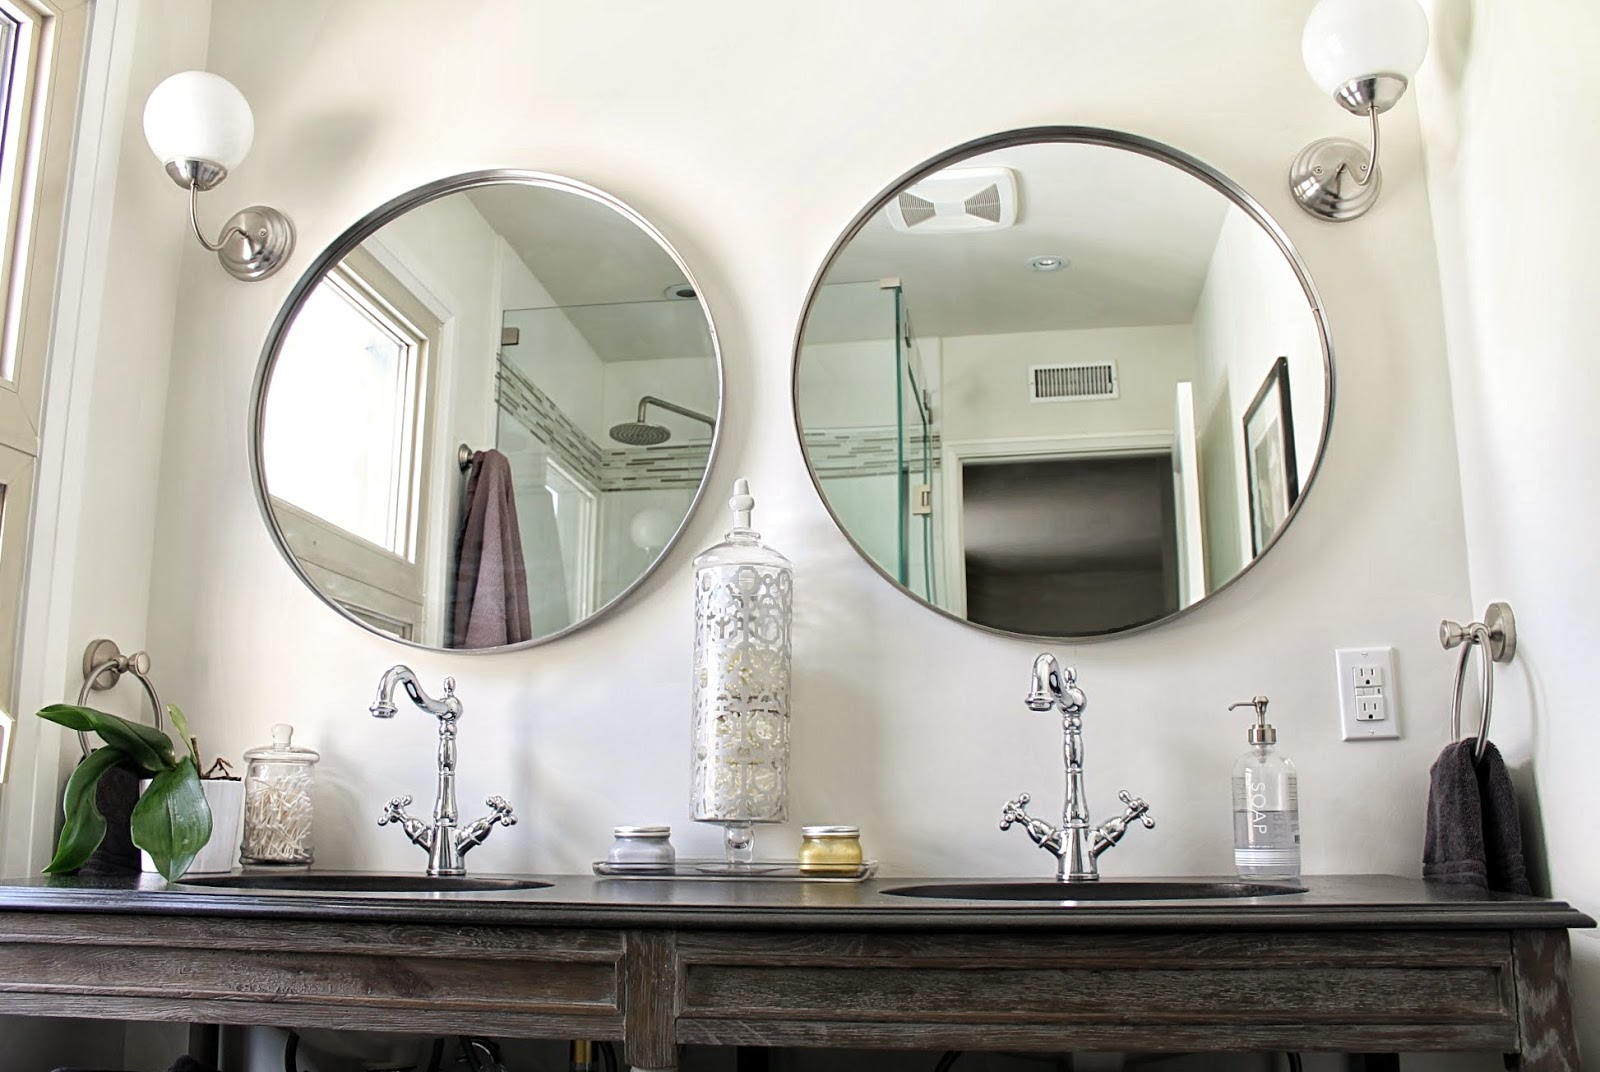 Design style decor decor master bath sourcebook for Bathroom goods